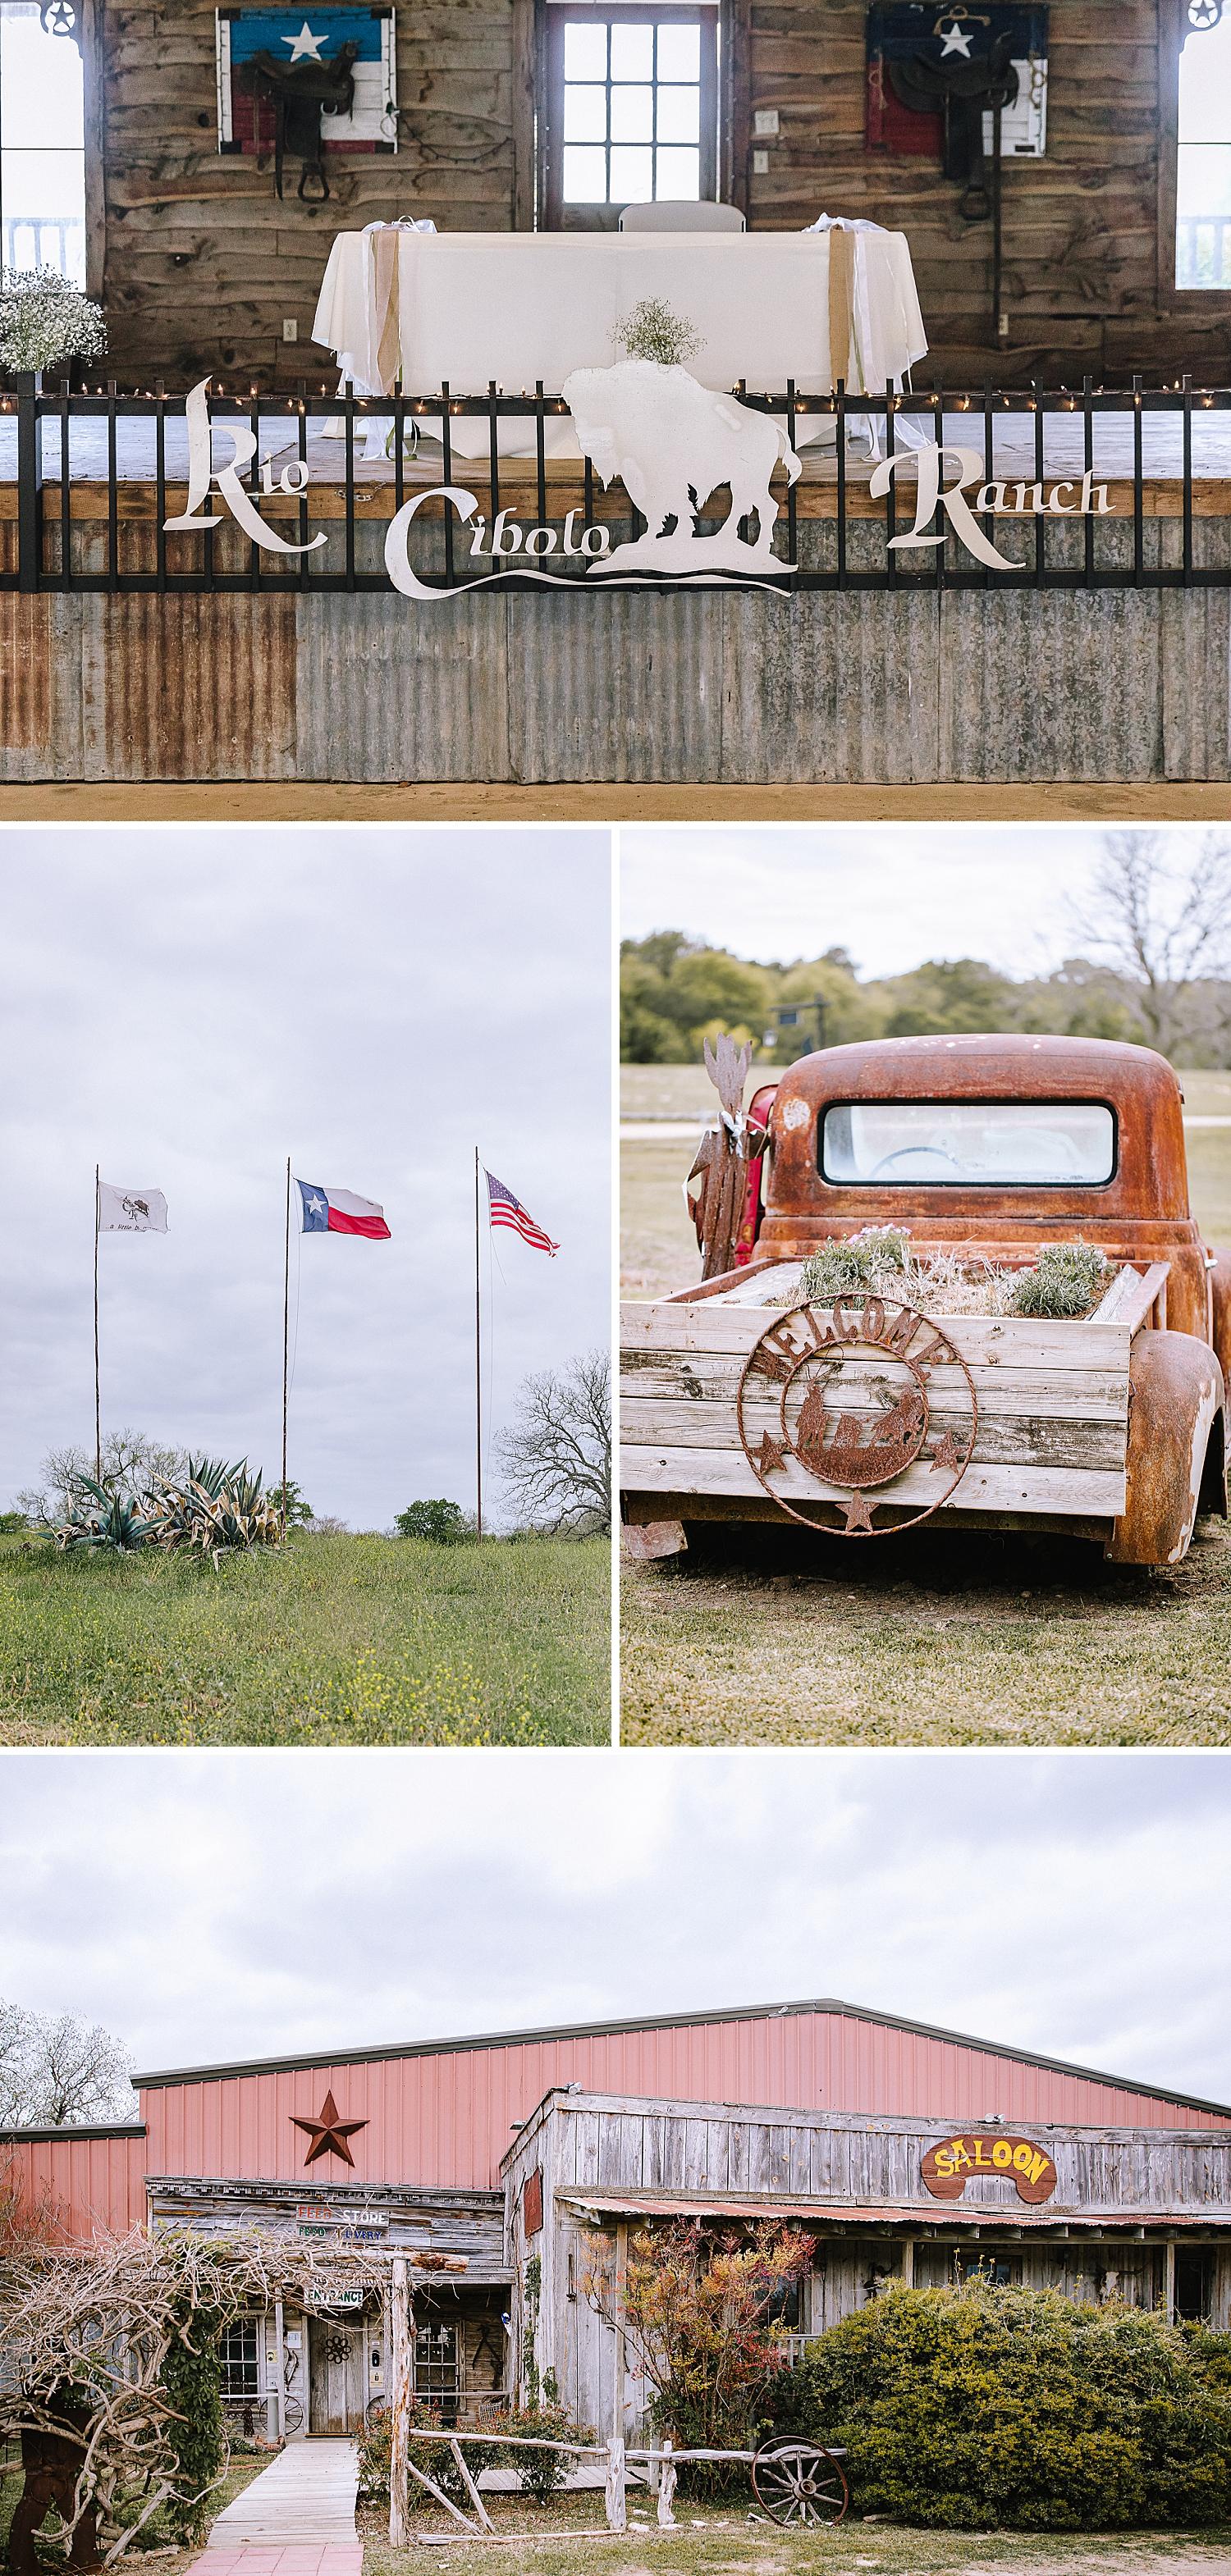 Rio-Cibilo-Ranch-Marion-Texas-Wedding-Rustic-Blush-Rose-Quartz-Details-Carly-Barton-Photography_0004.jpg